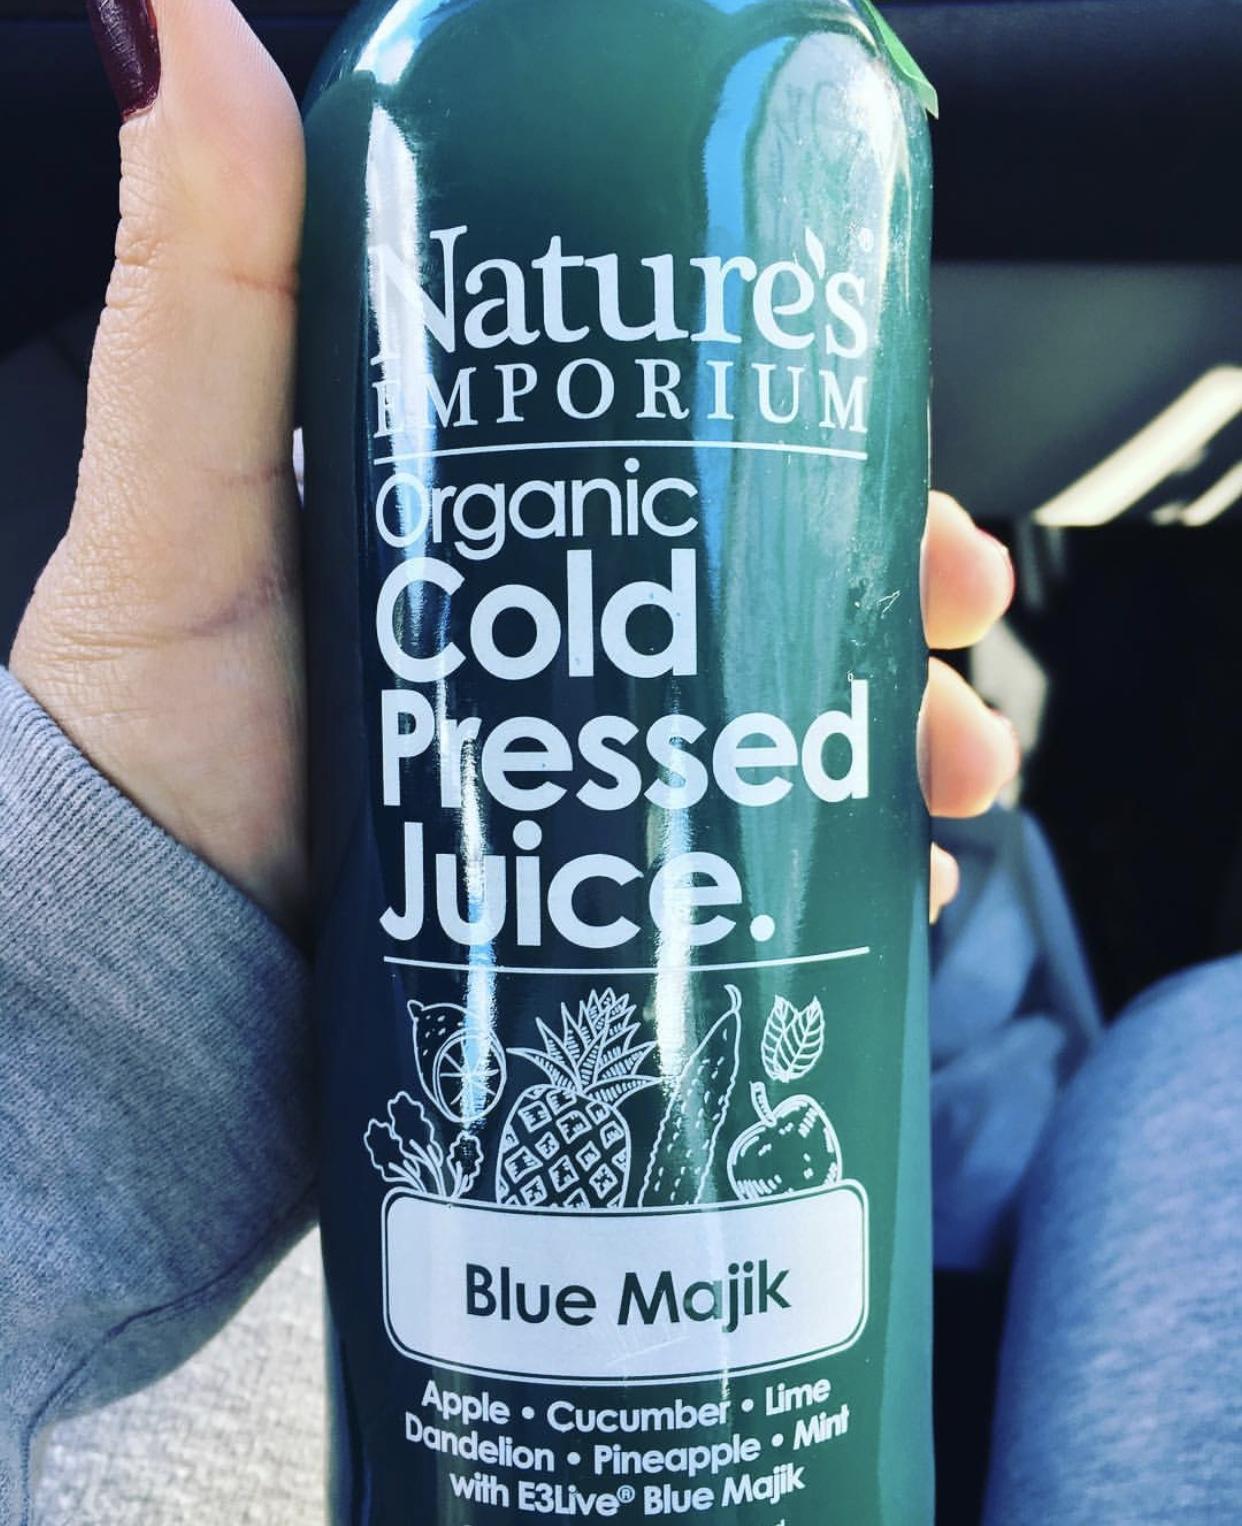 Blue Majik Drink